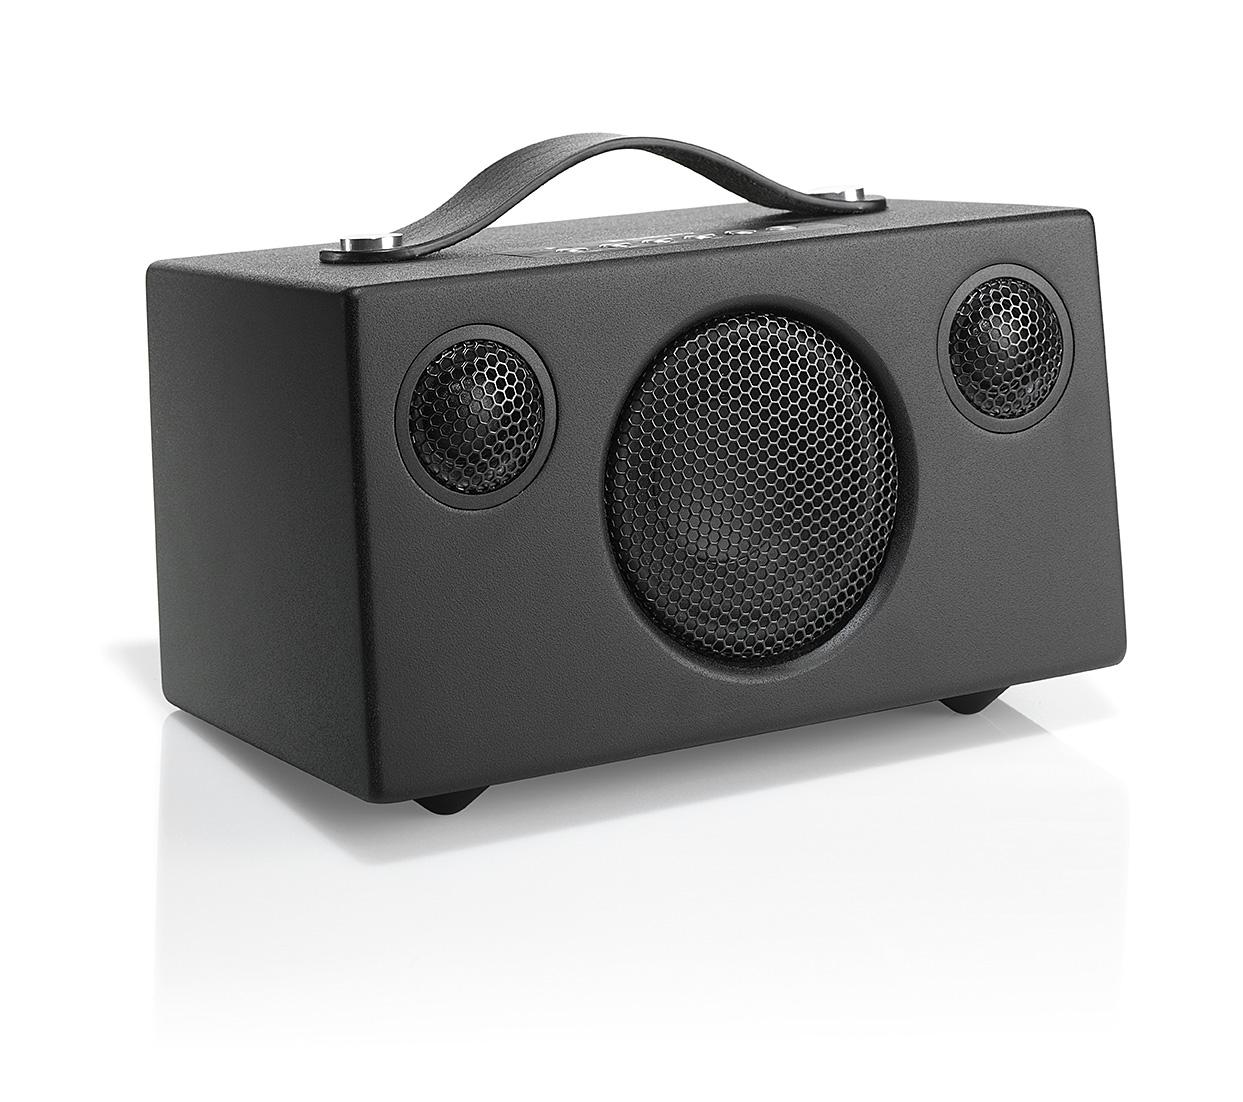 Bilde av Audio Pro Addon T3+ Portable Wireless Bluetooth Speaker - Coal Black